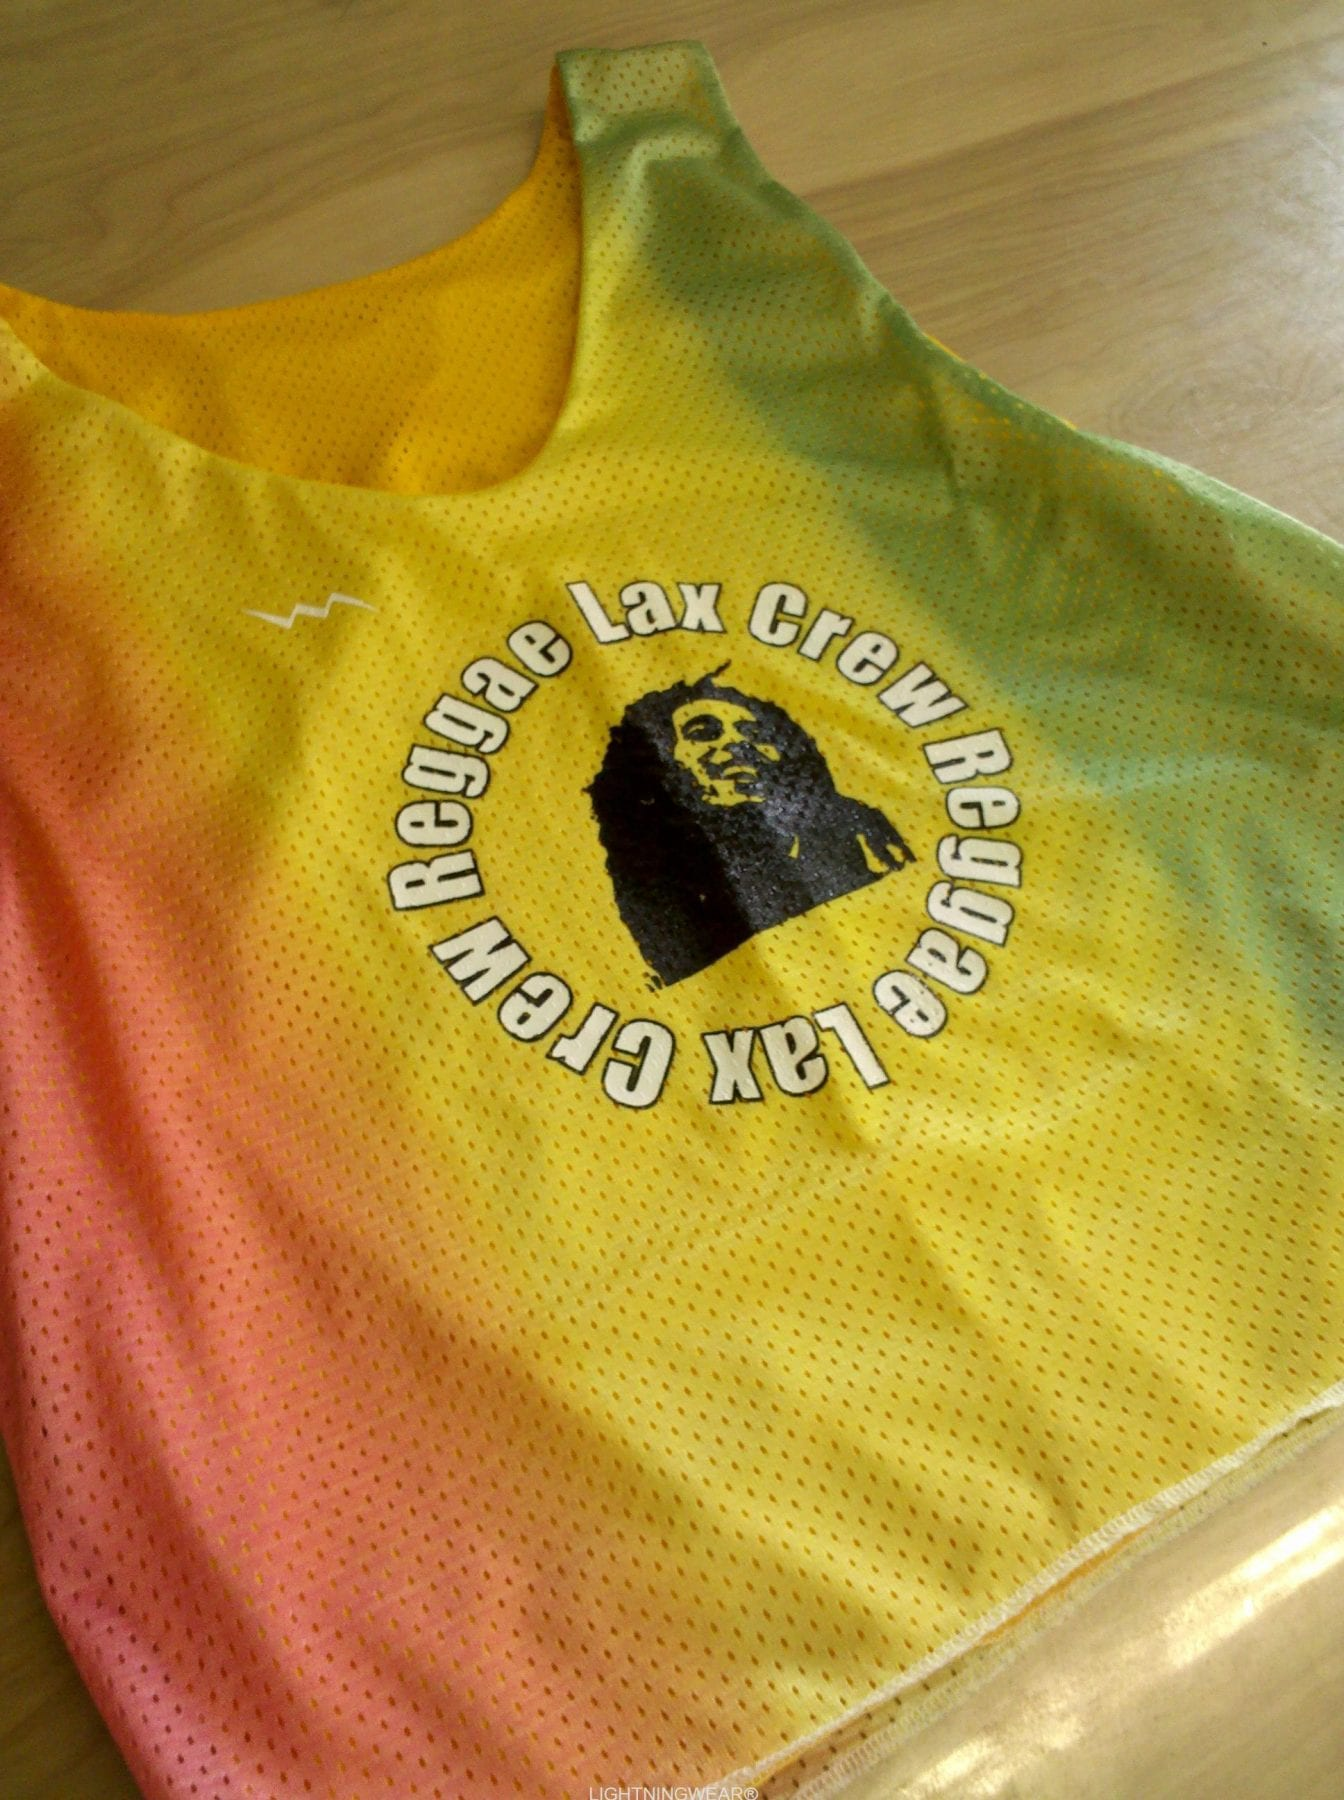 reggae lax crew pinnies